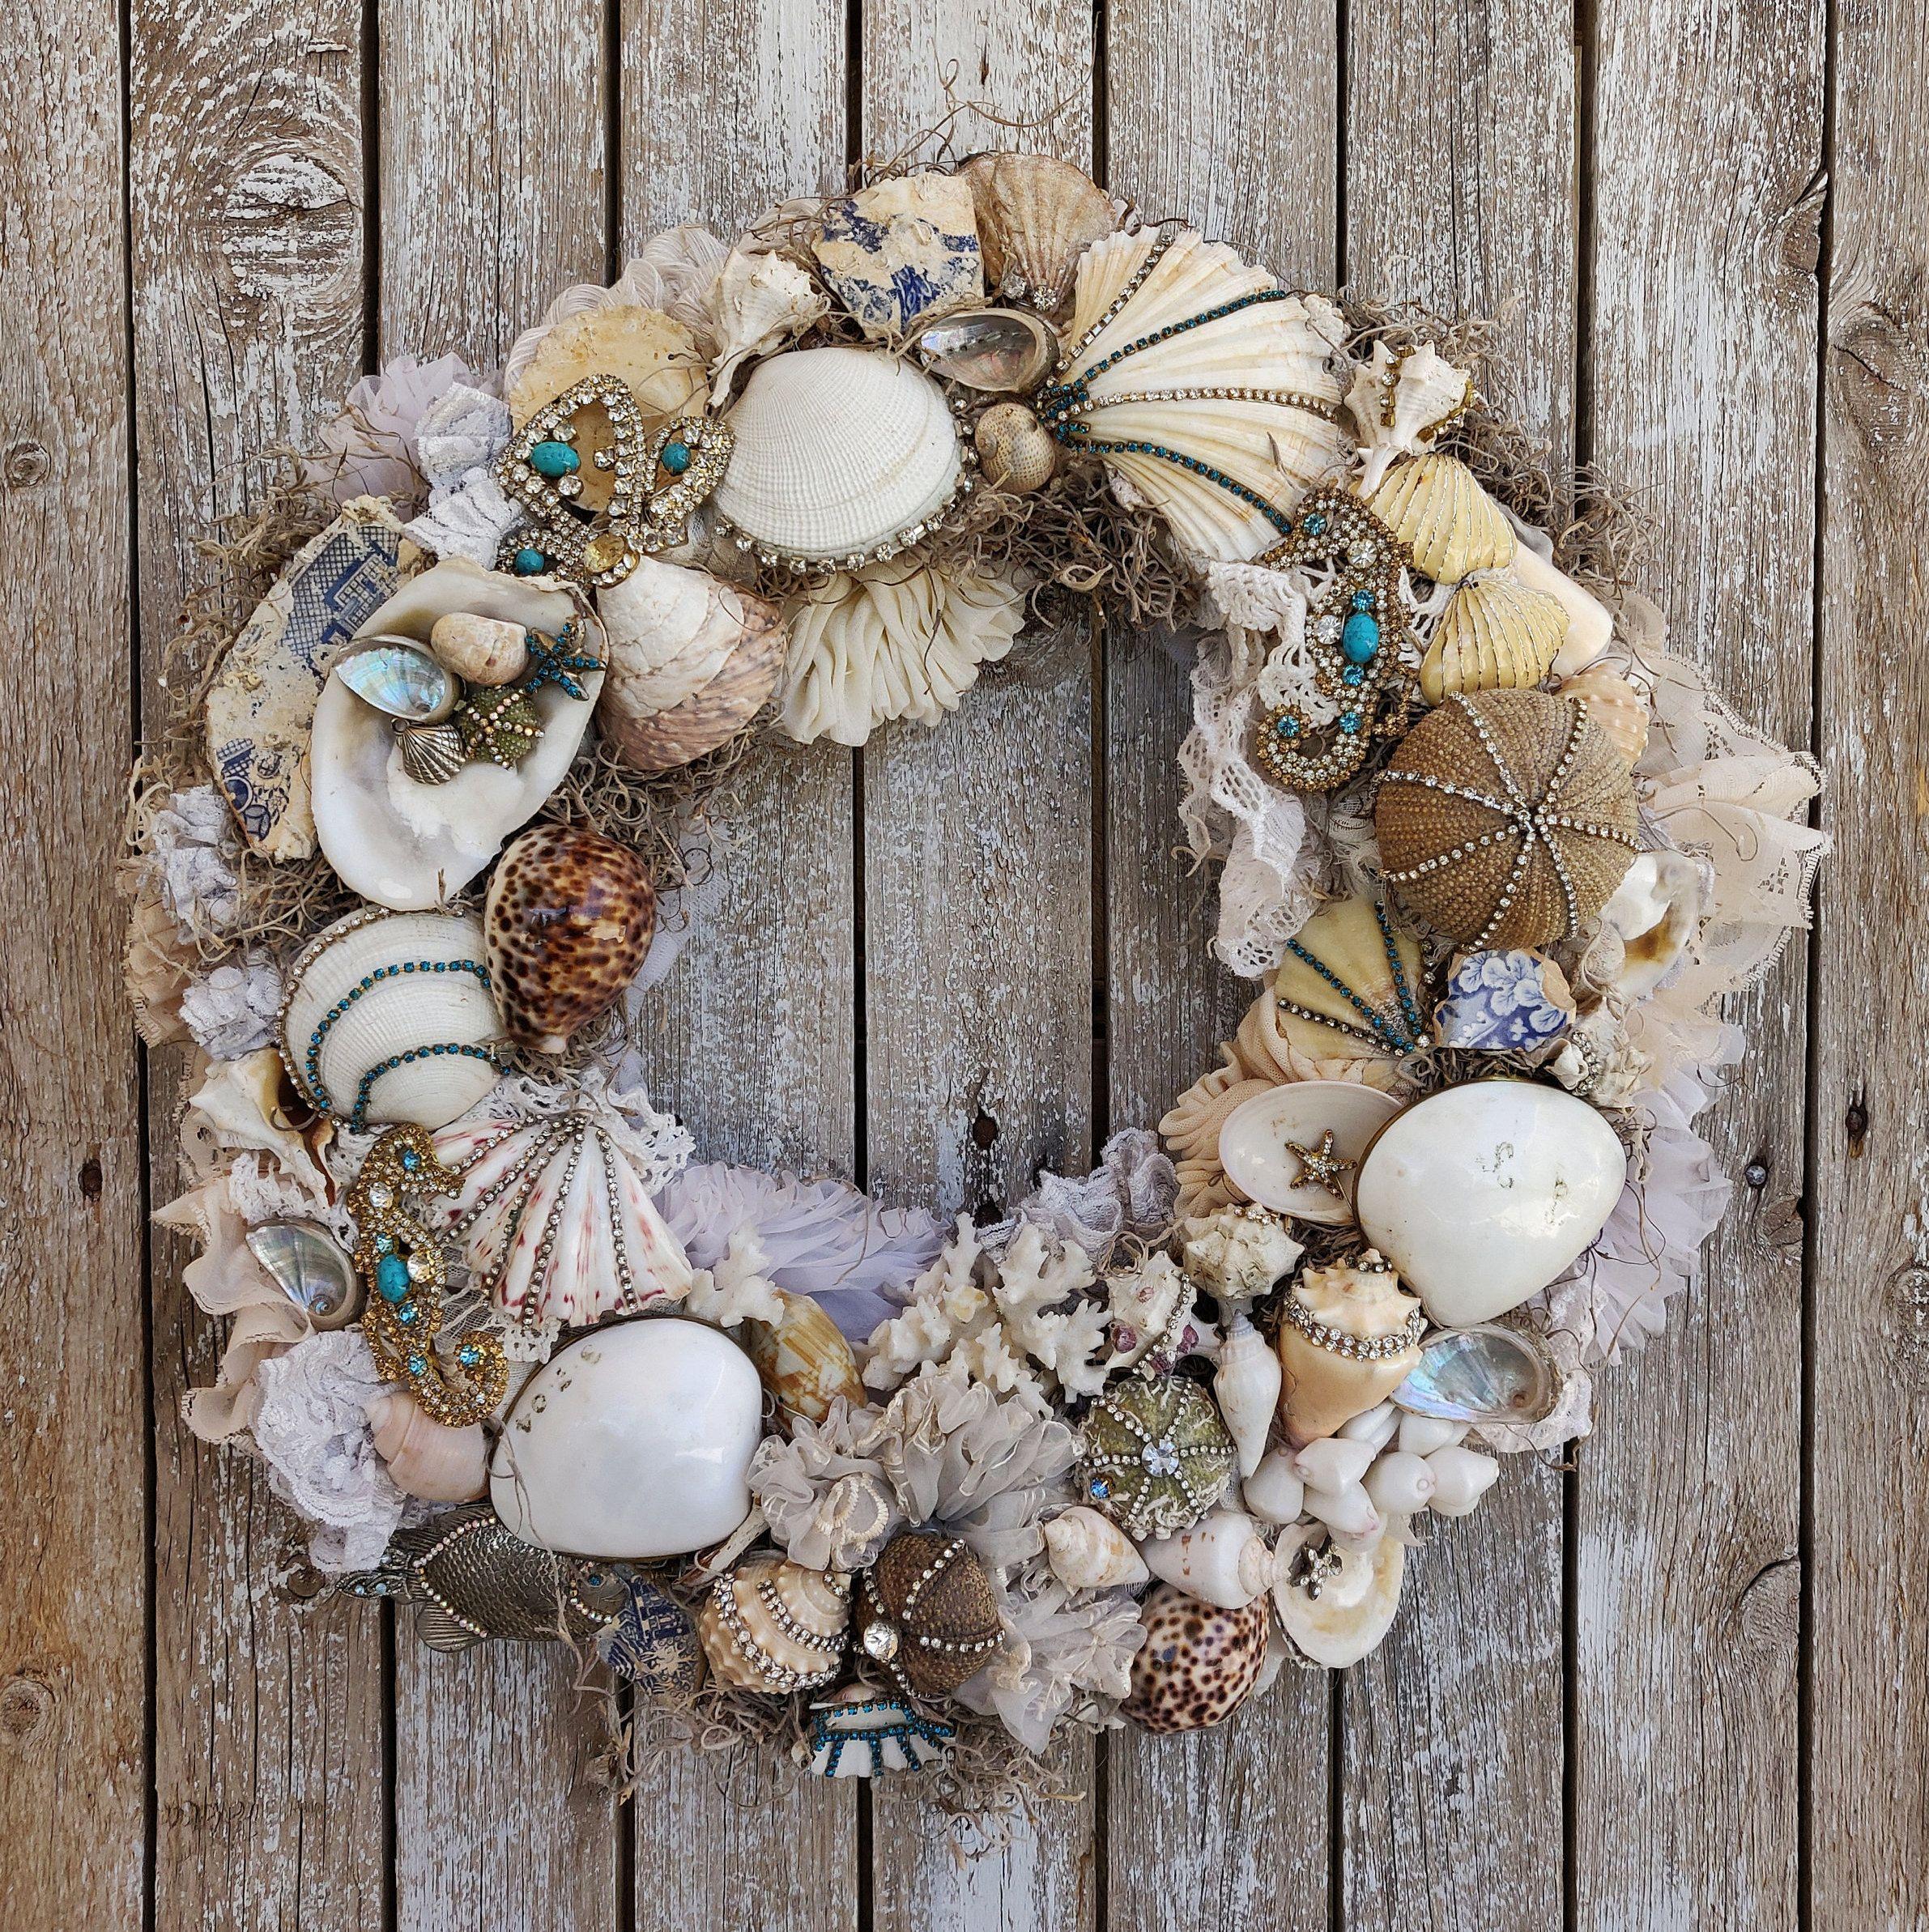 Gift for Her Beach Wreath for Front Door Beach Decor Summer Wreath Beachy Wreath Beach Door Hanger Ocean Decor Seashore Wreath Beach